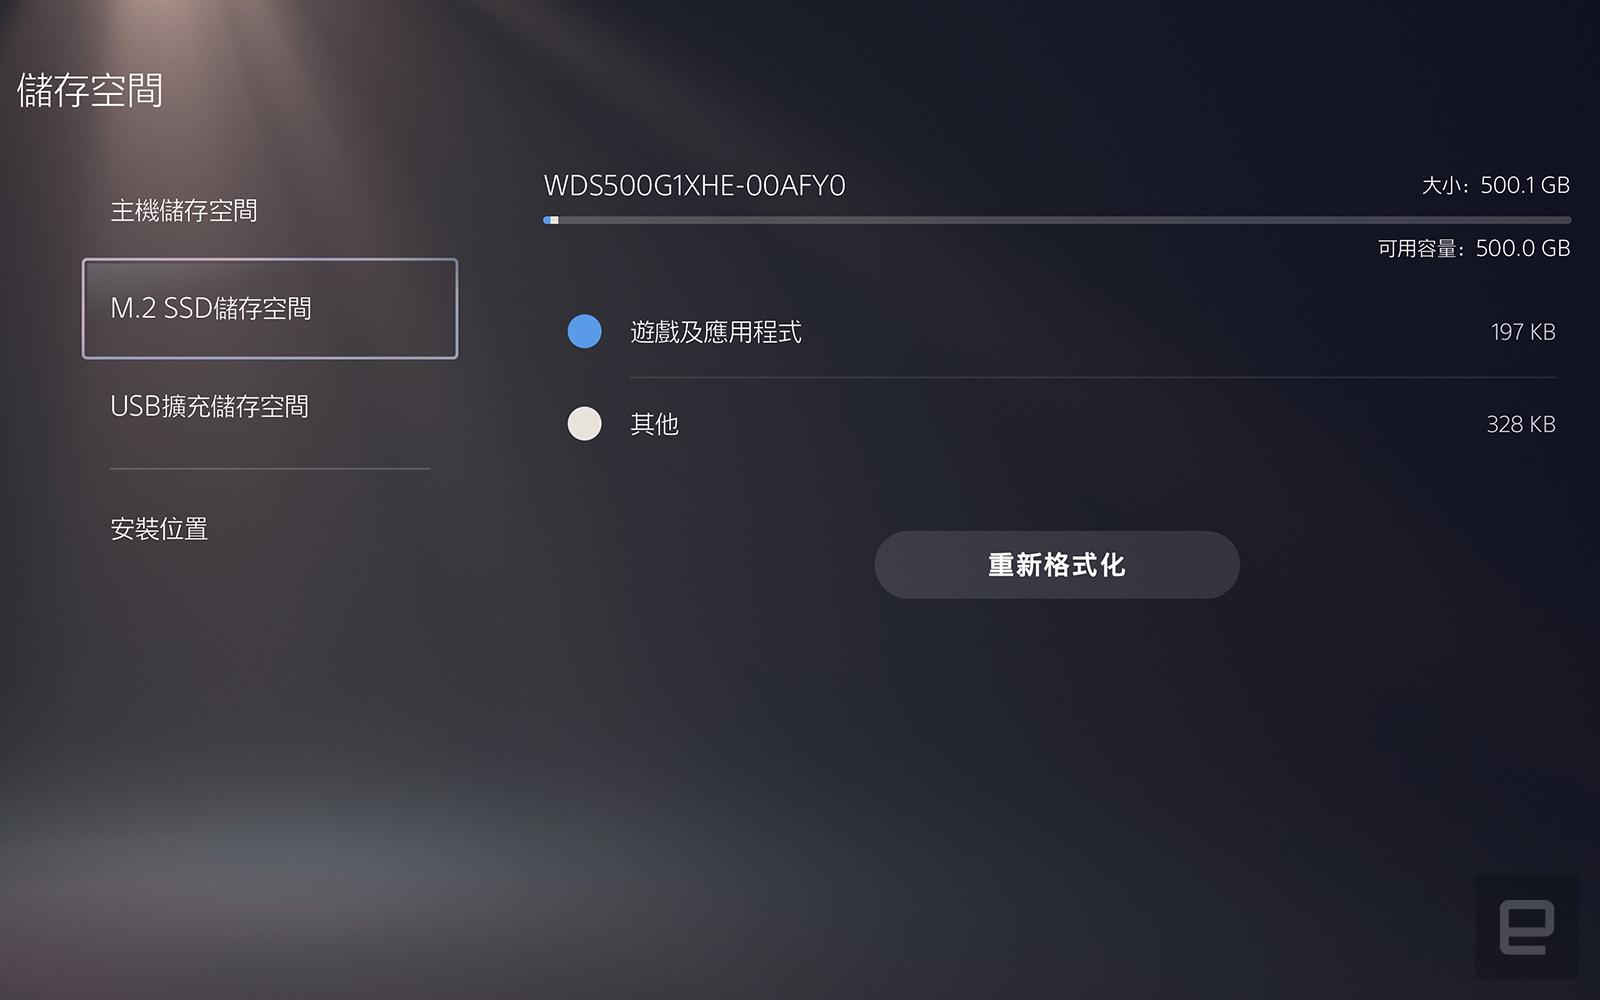 PS5 Western Digital M.2 SSD